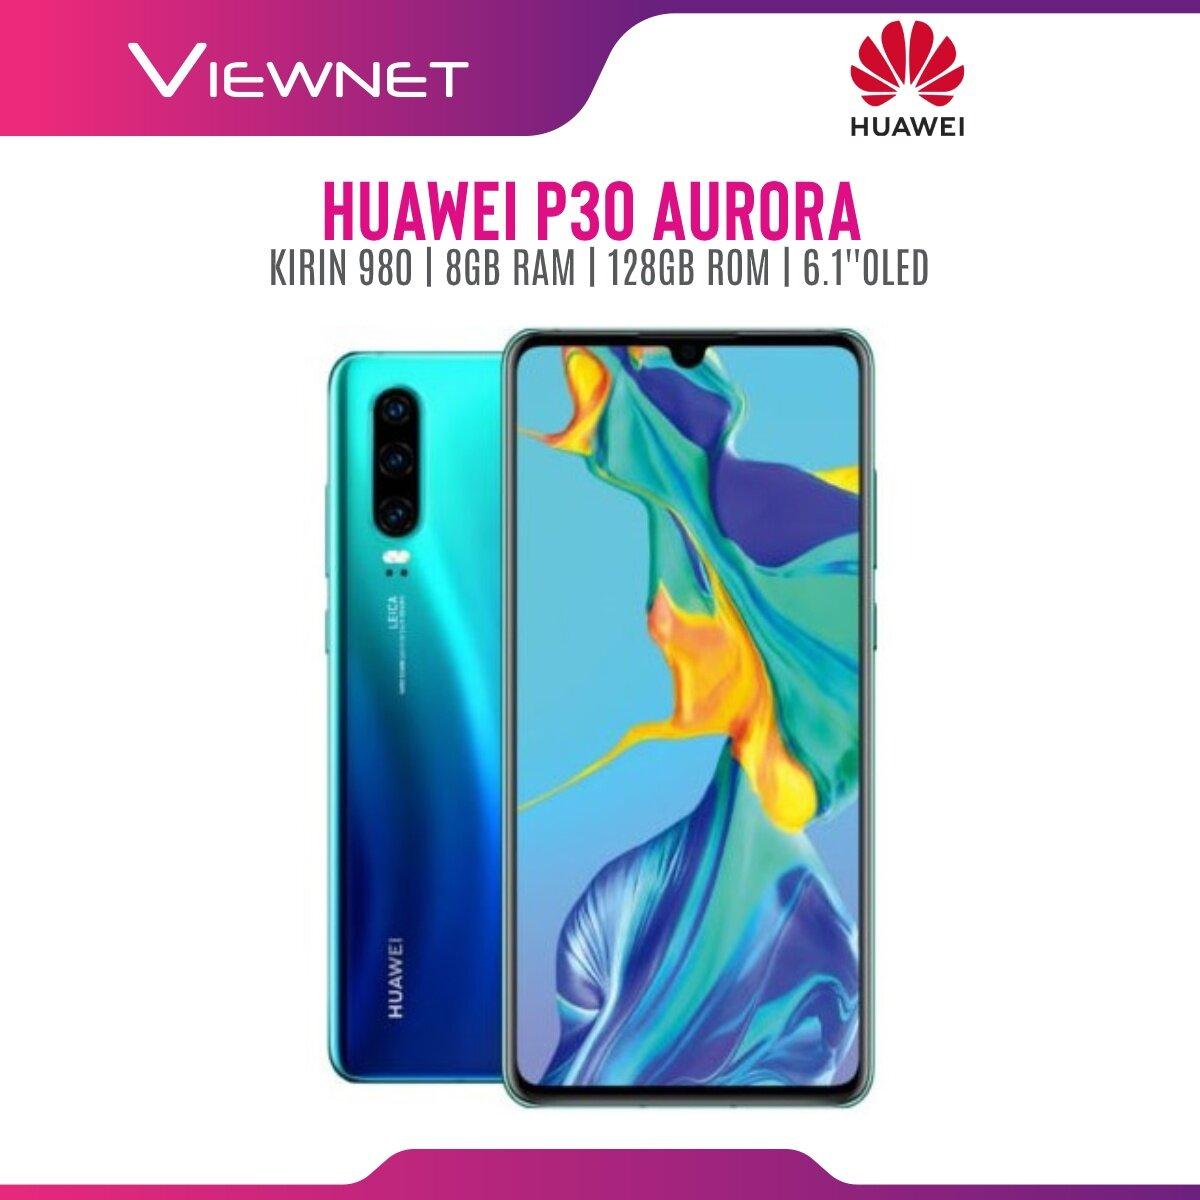 Huawei P30 Smartphone 8GB + 128GB (Aurora/Breathing Crystal)